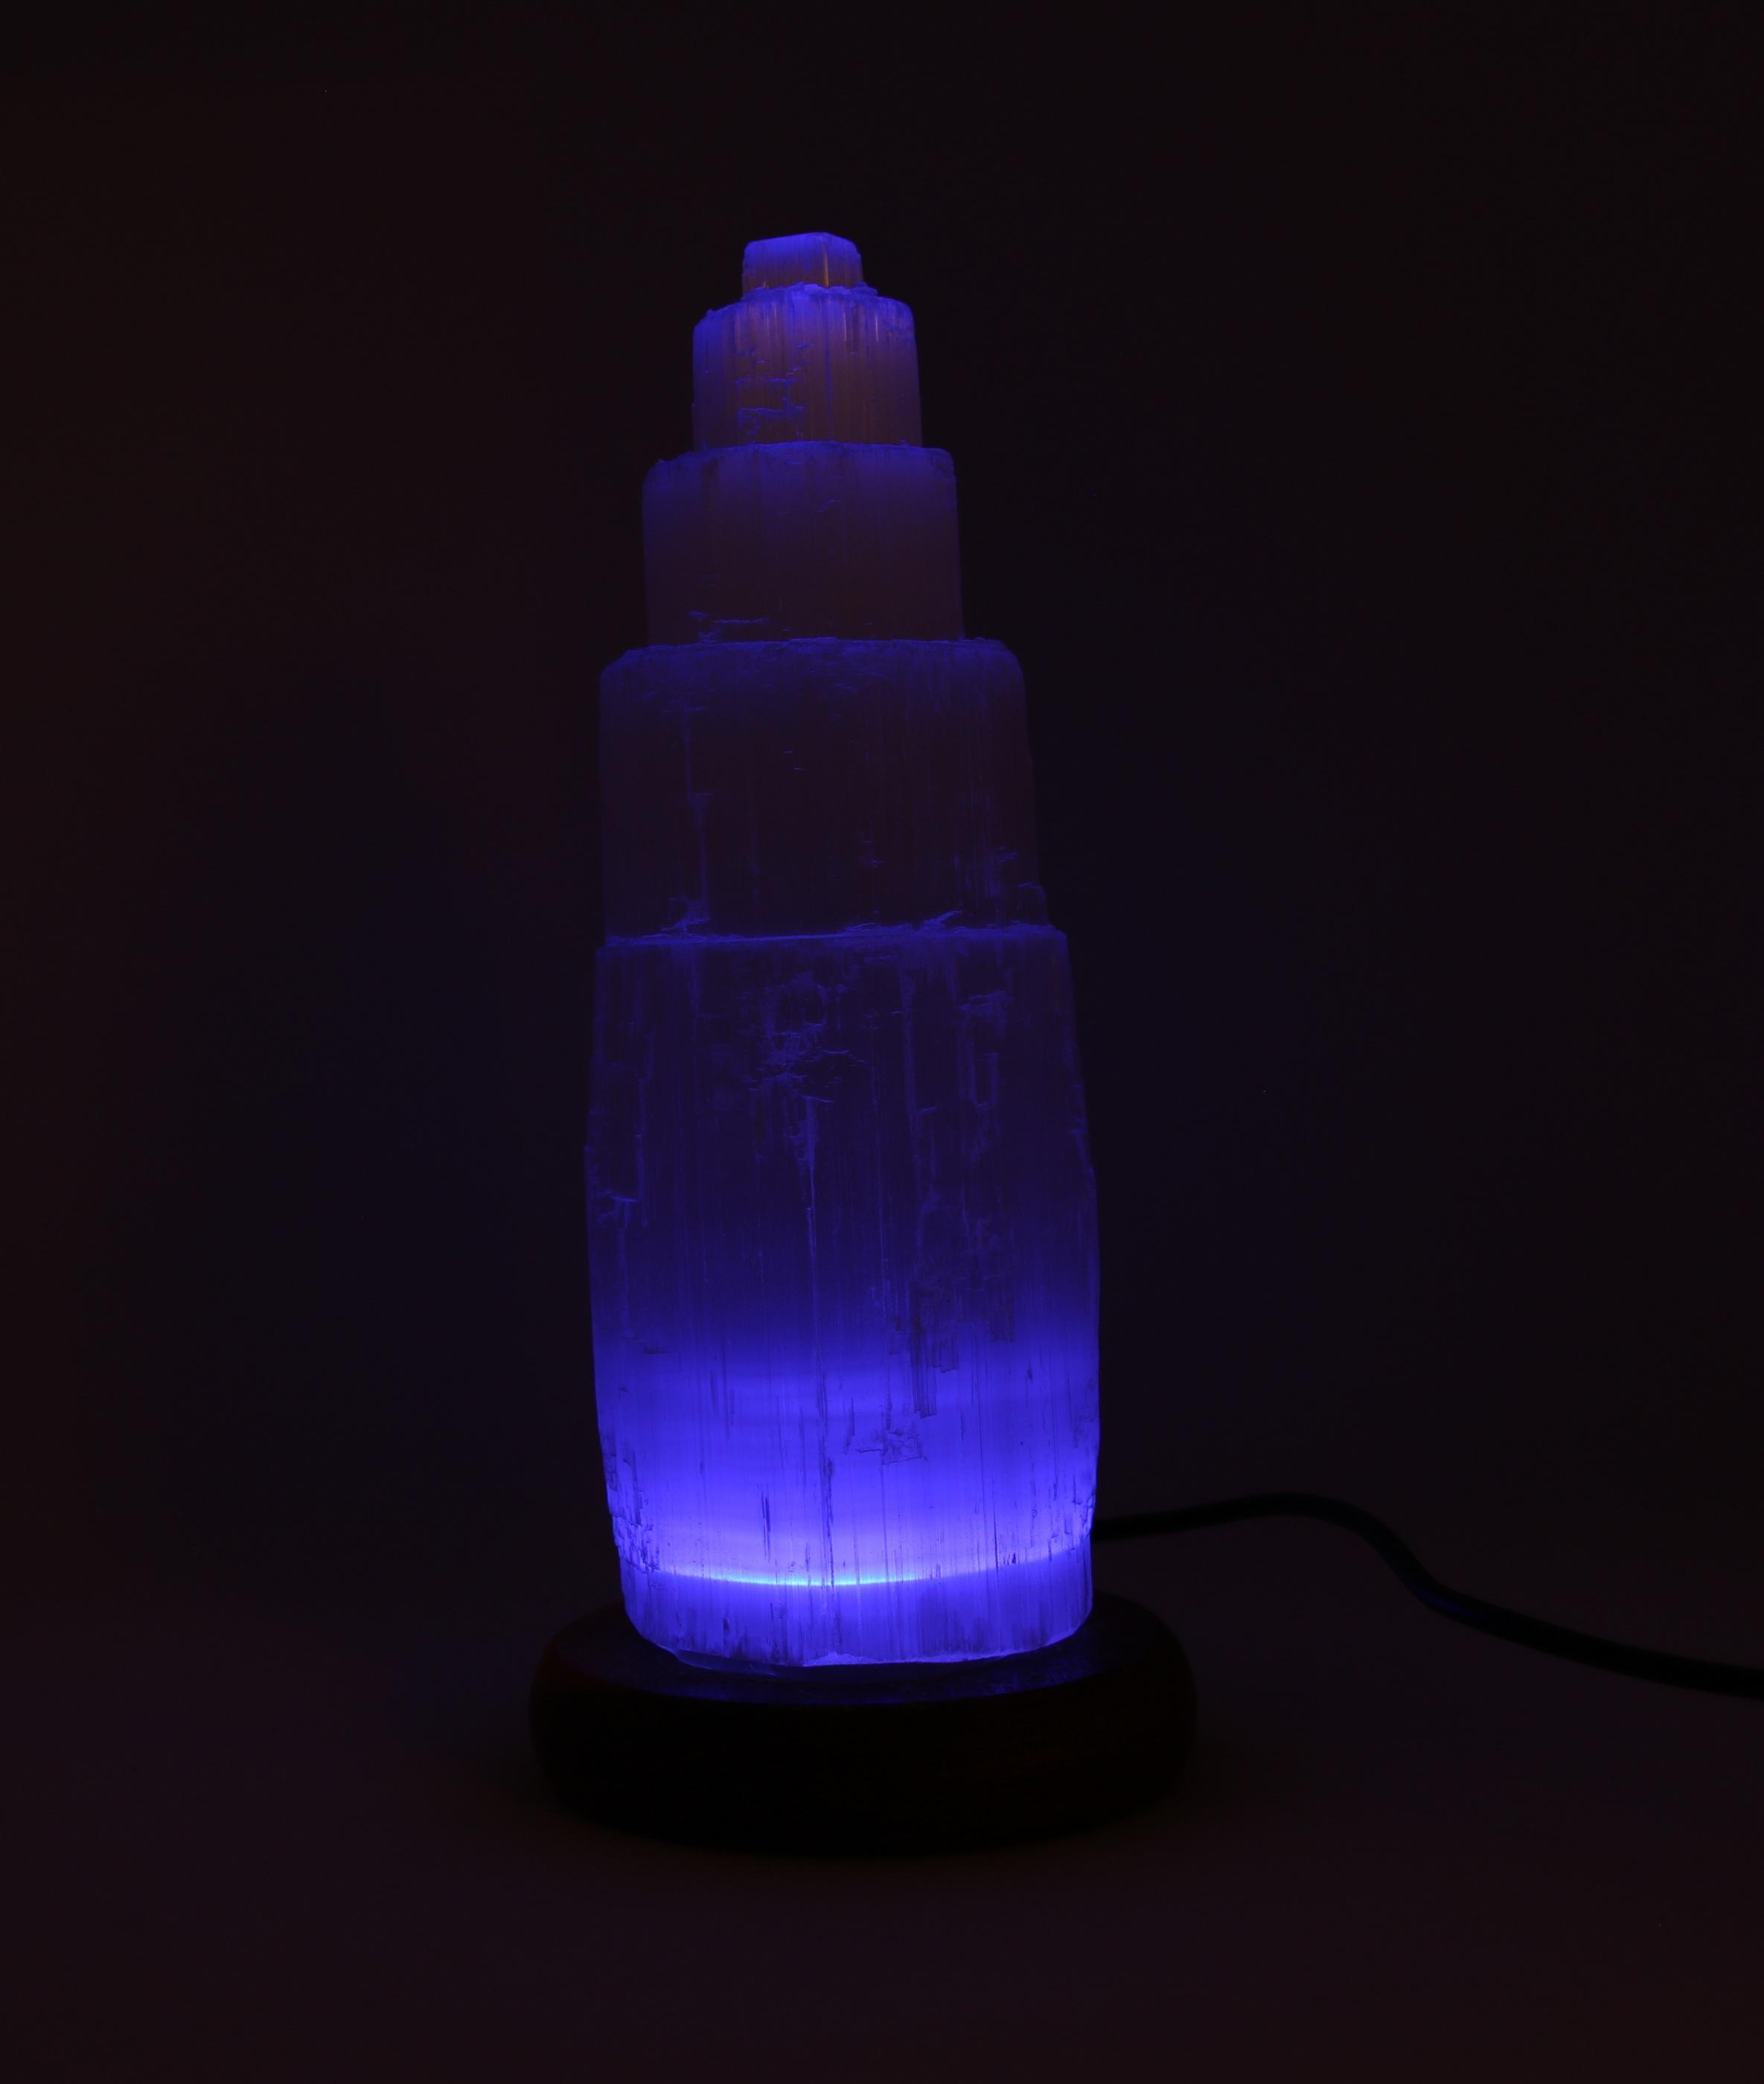 Selenit lampa med fluorescerande ljus wellness ayurveda halmstad sweden svensk lampa